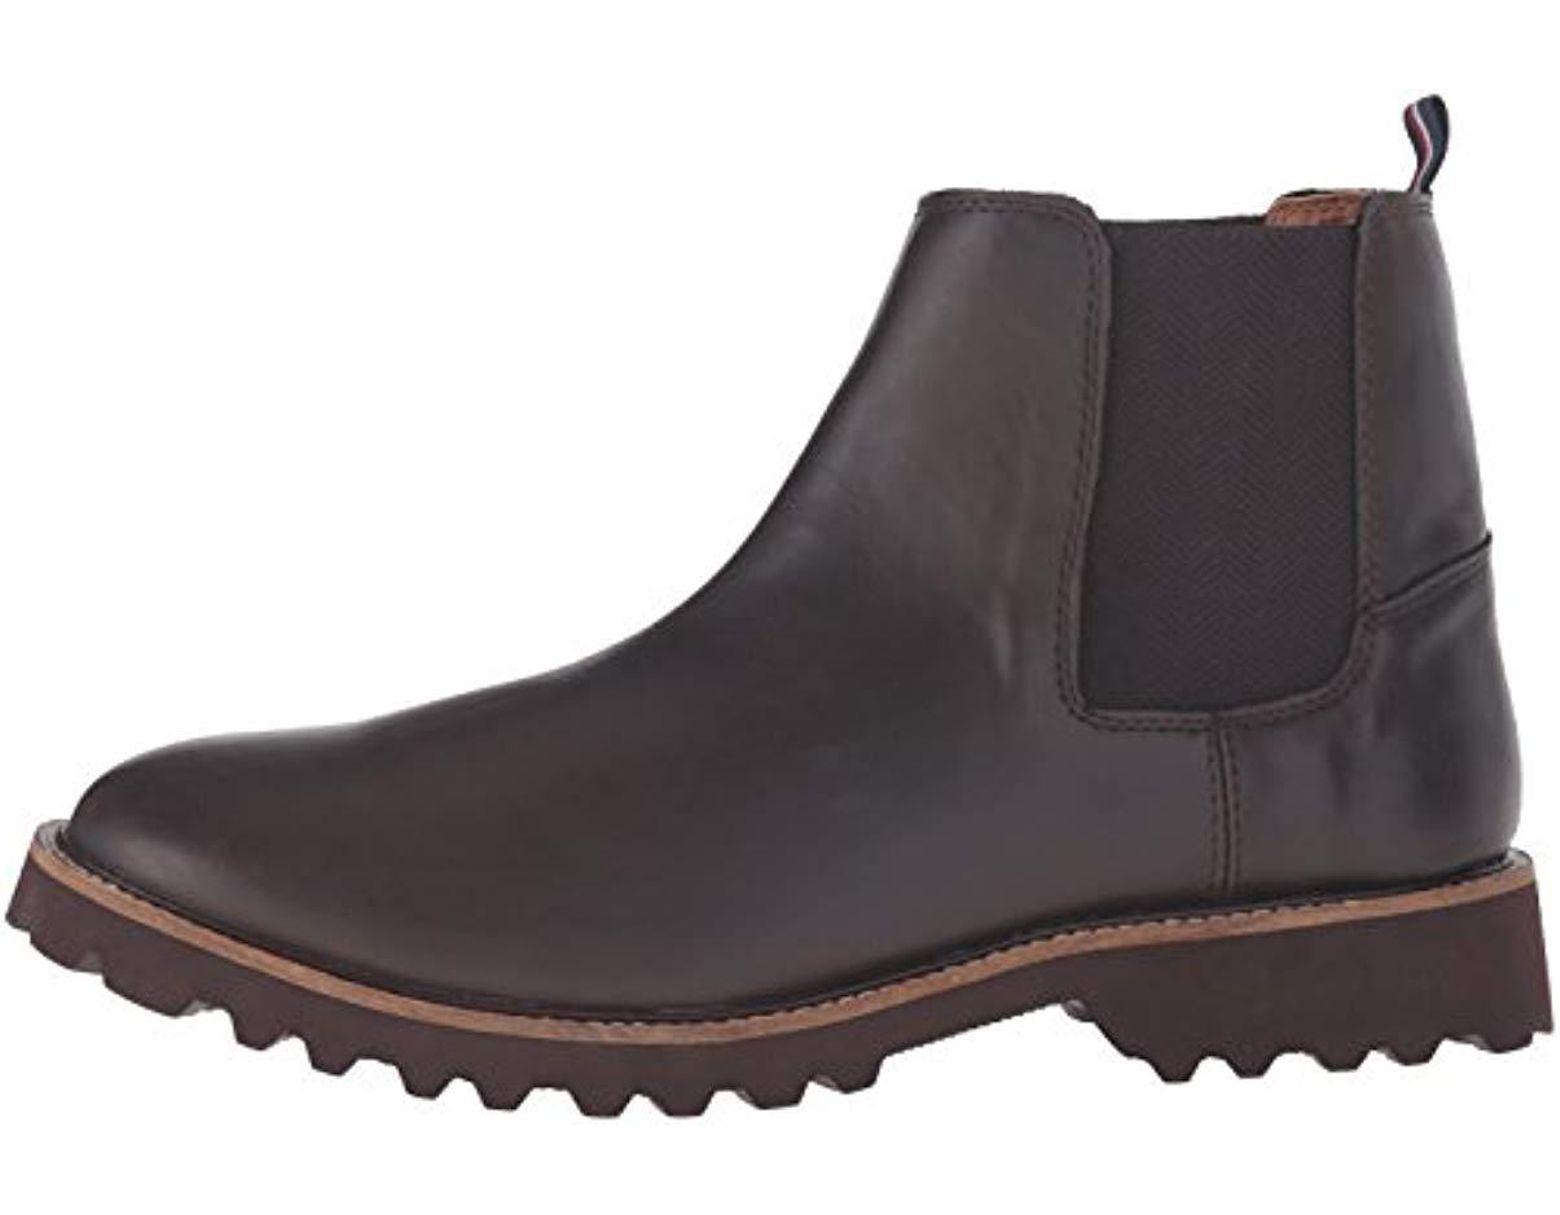 9cd5ac1438c Men's Brown Ontario2 Ankle Bootie